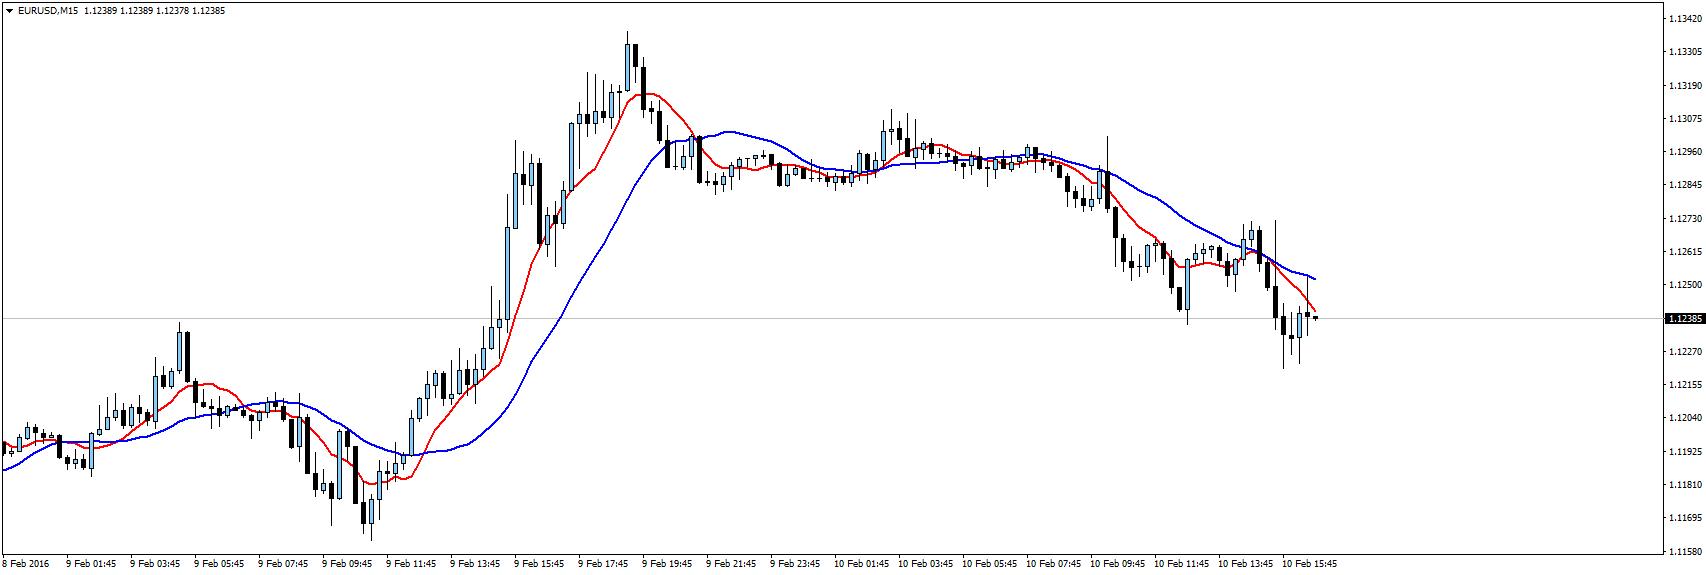 EURUSDM15